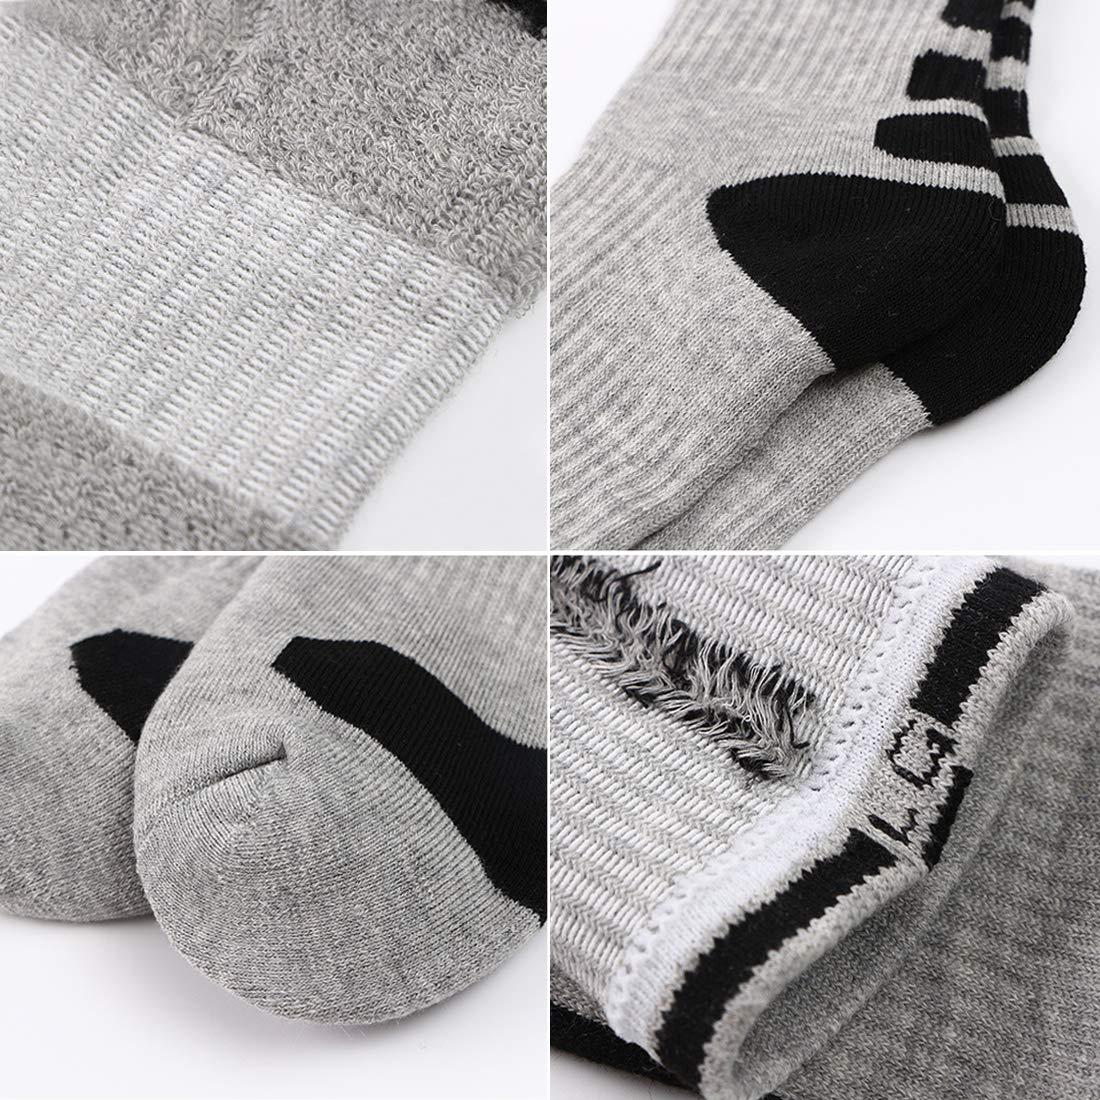 Mens Dri-fit Cushioned Basketball Socks Athletic Long Compression Socks Pack